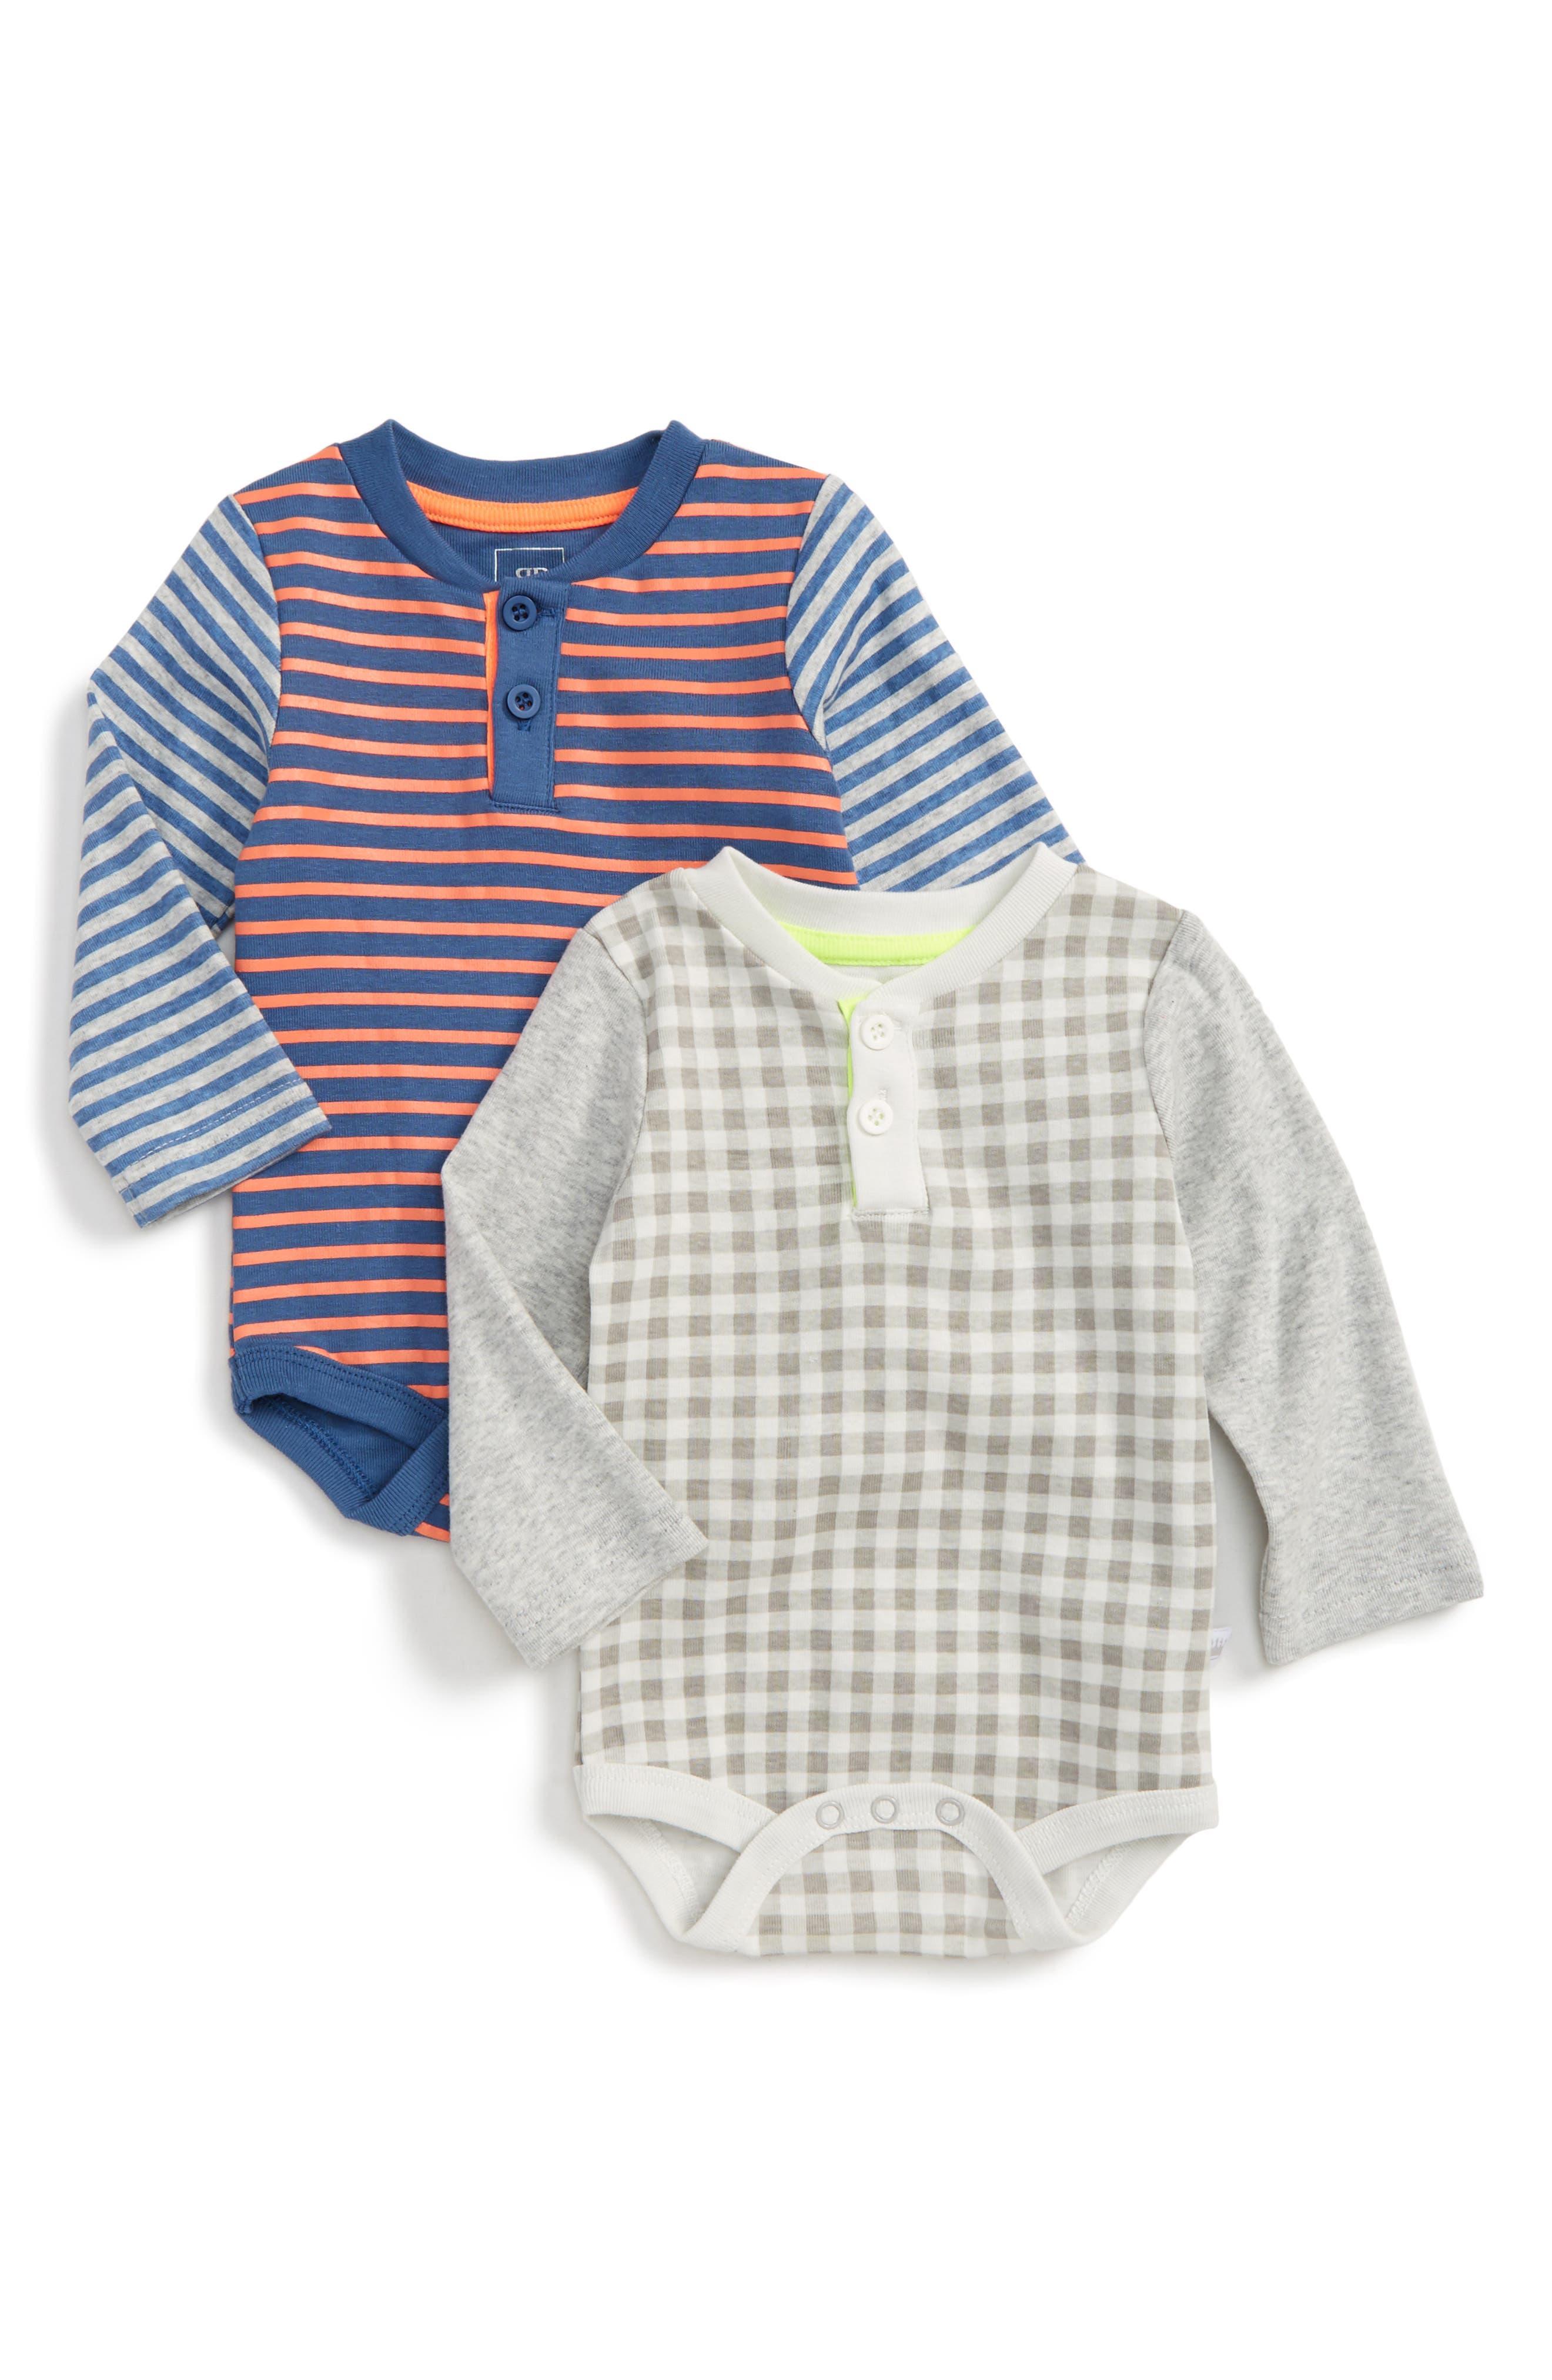 Rosie Pope 2-Pack Henley Bodysuits (Baby Boys)